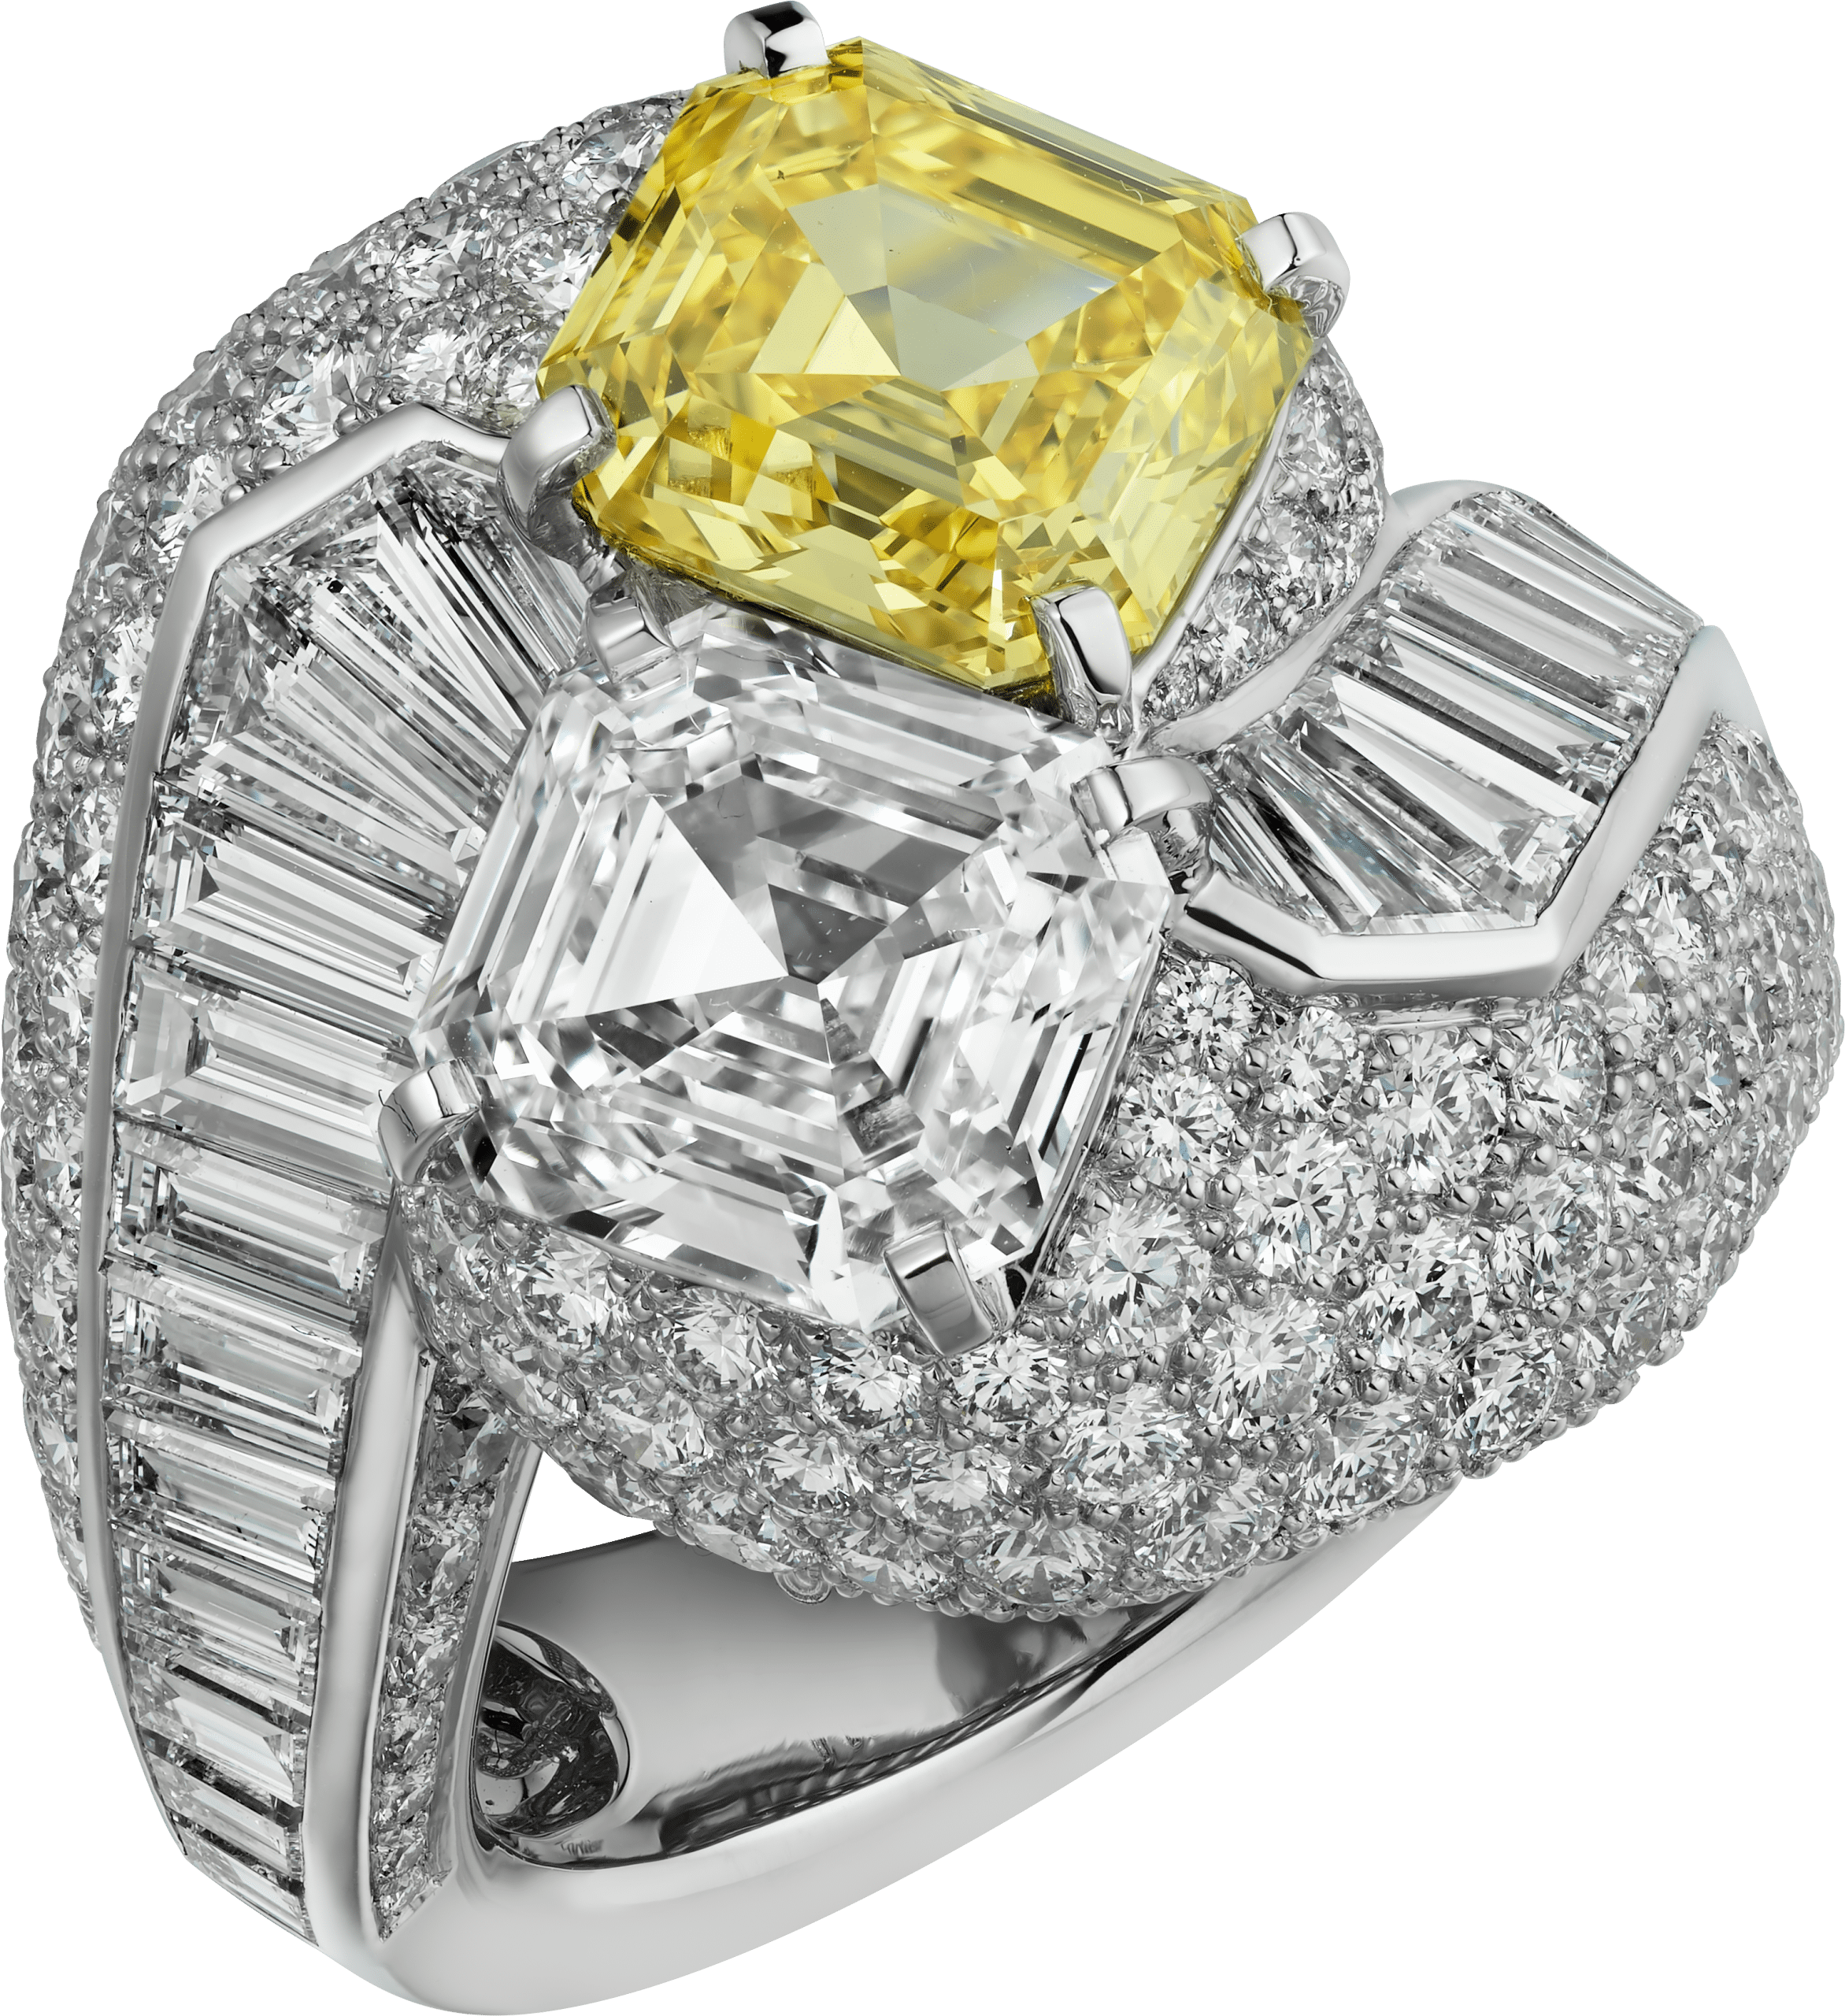 YELLOW COBALT黃鑽戒指